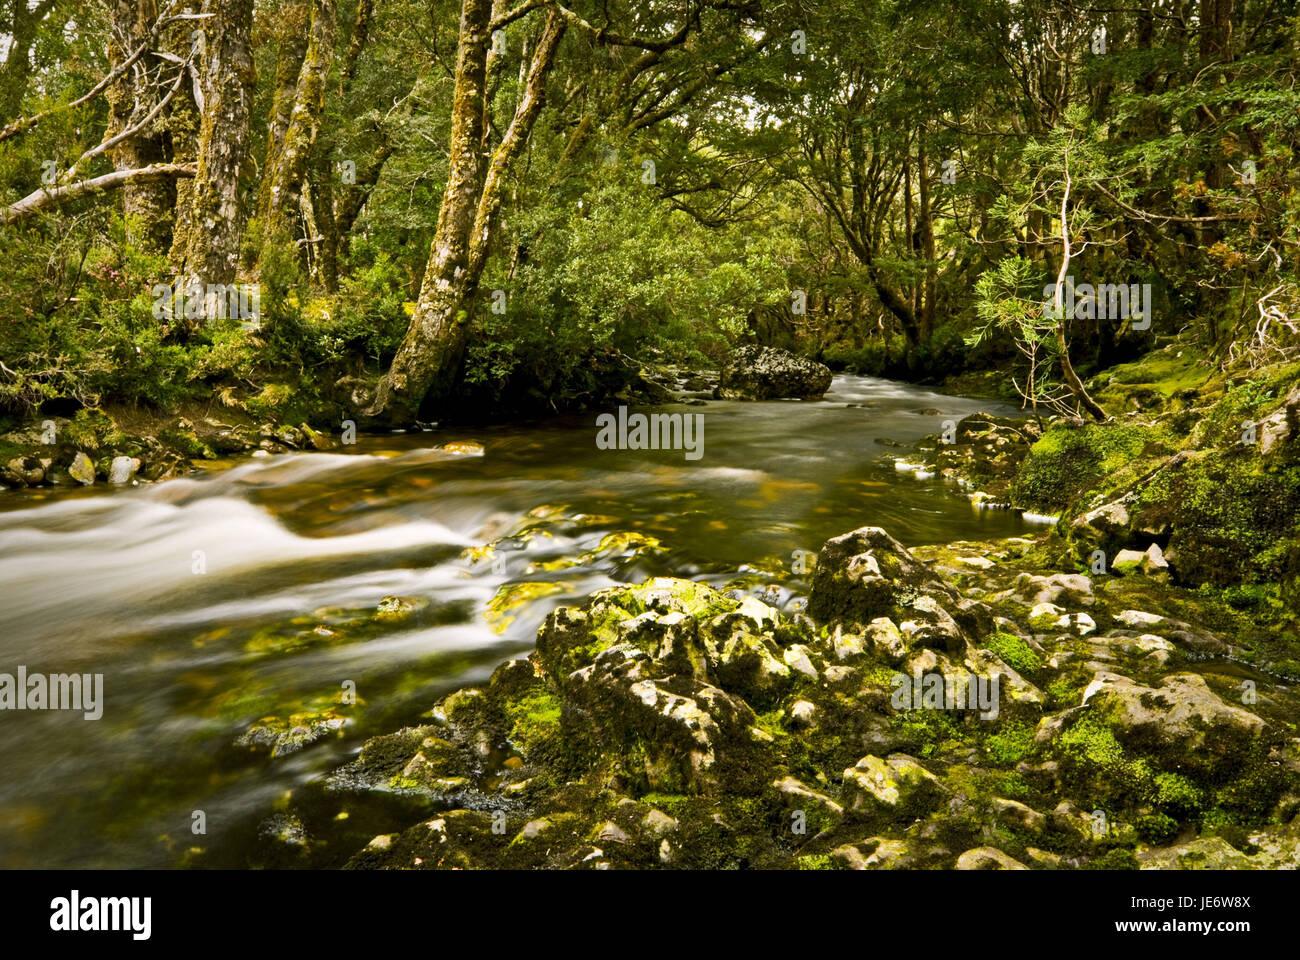 Australia, Tasmania, Flatly, Cradle Mountain, national park, rainforest, - Stock Image